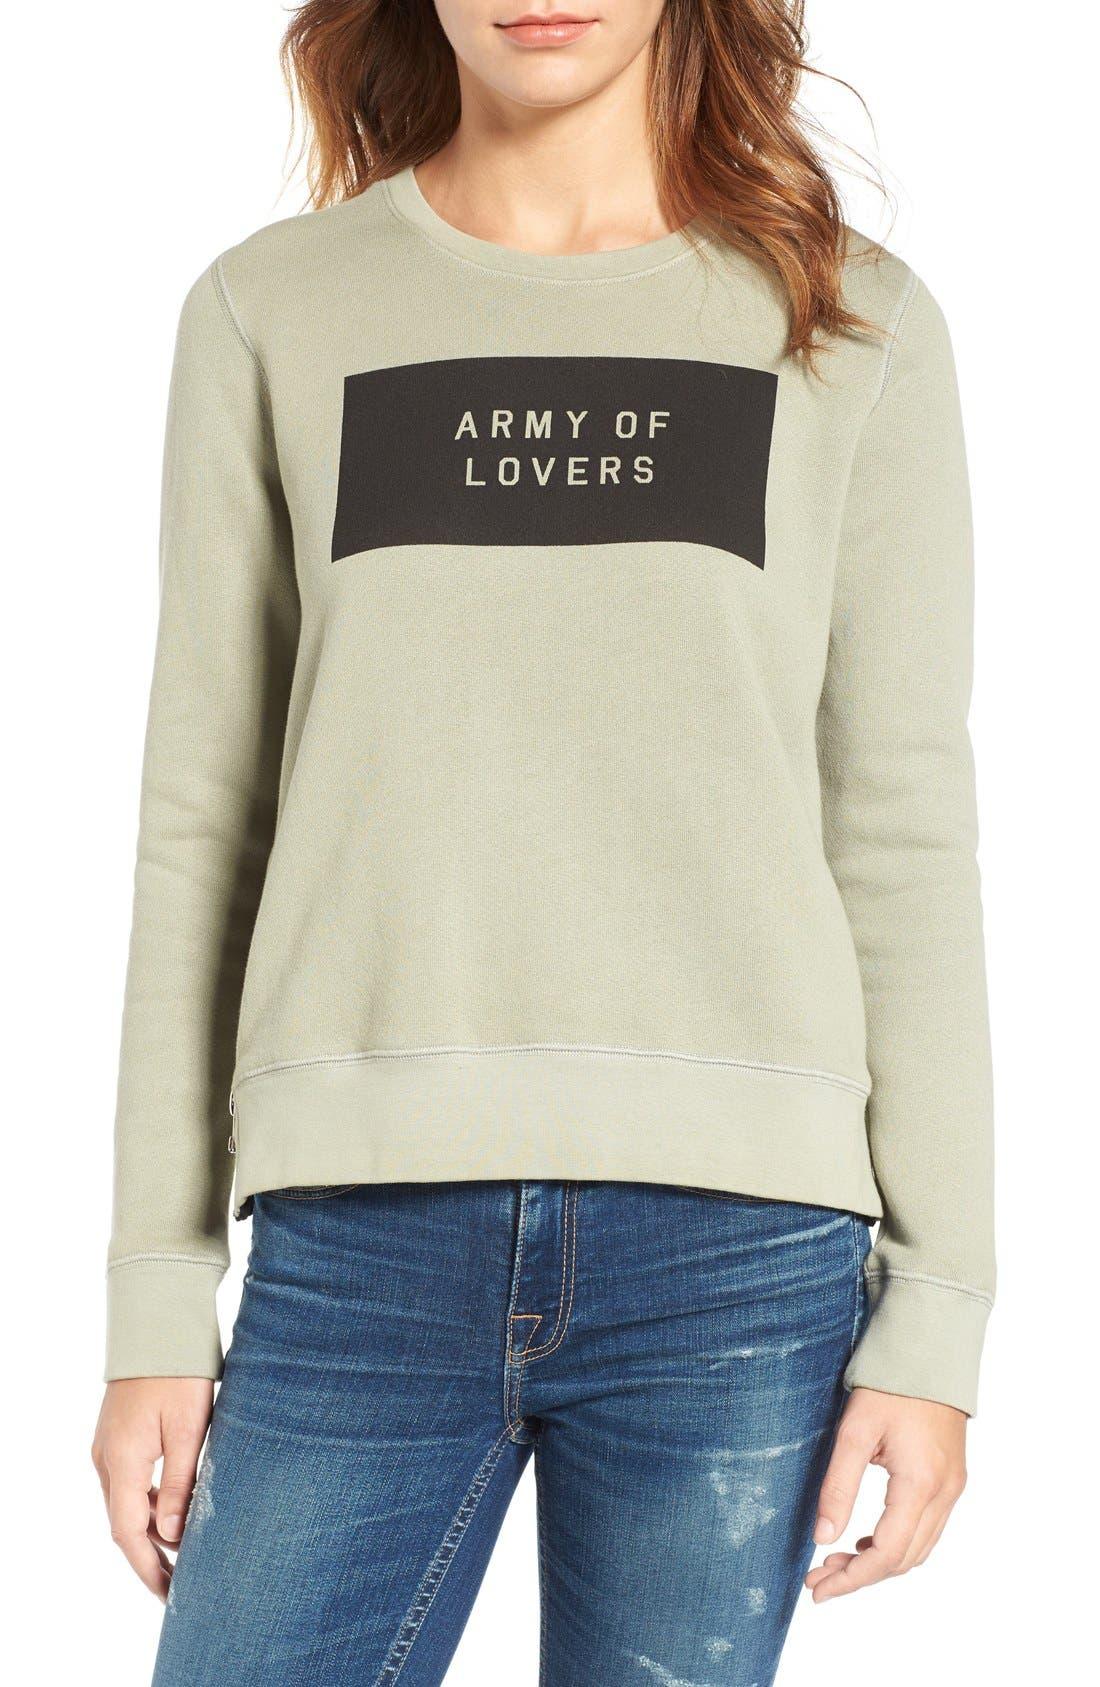 Army of Lovers Side Zip Sweatshirt,                             Main thumbnail 1, color,                             301